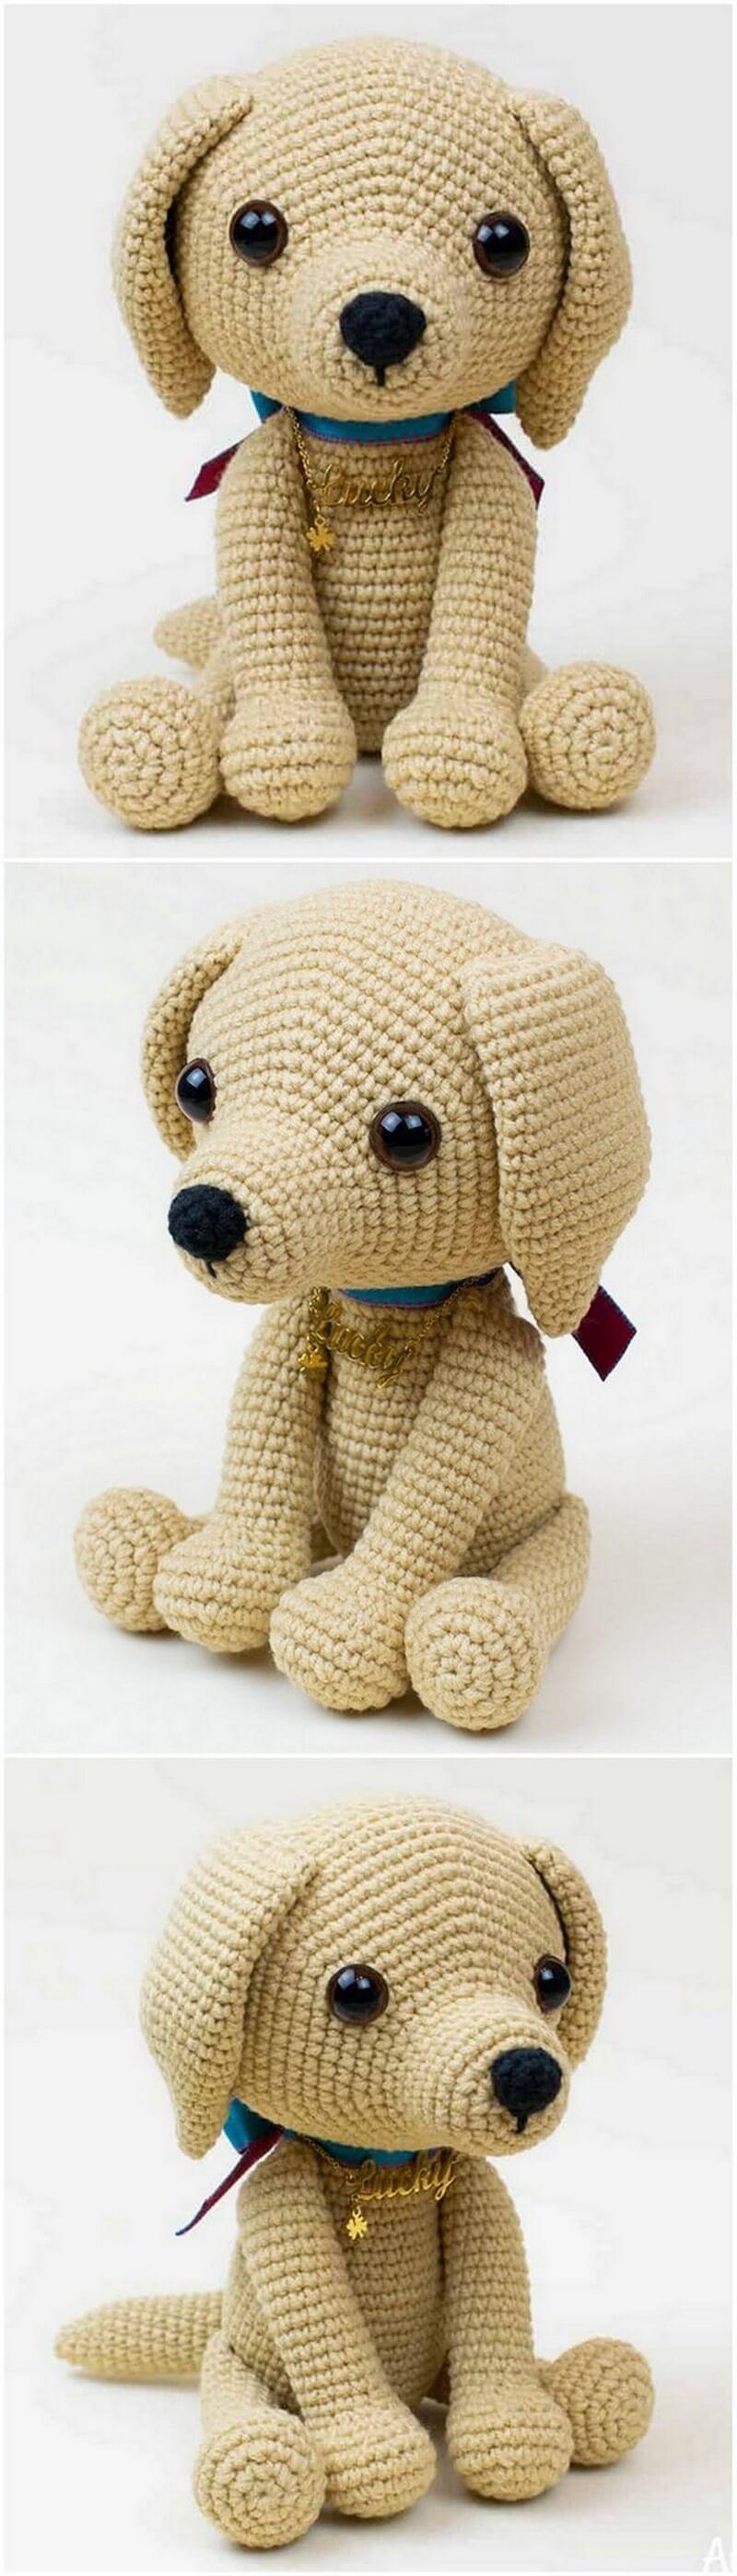 Crochet Amigurumi Pattern (26)